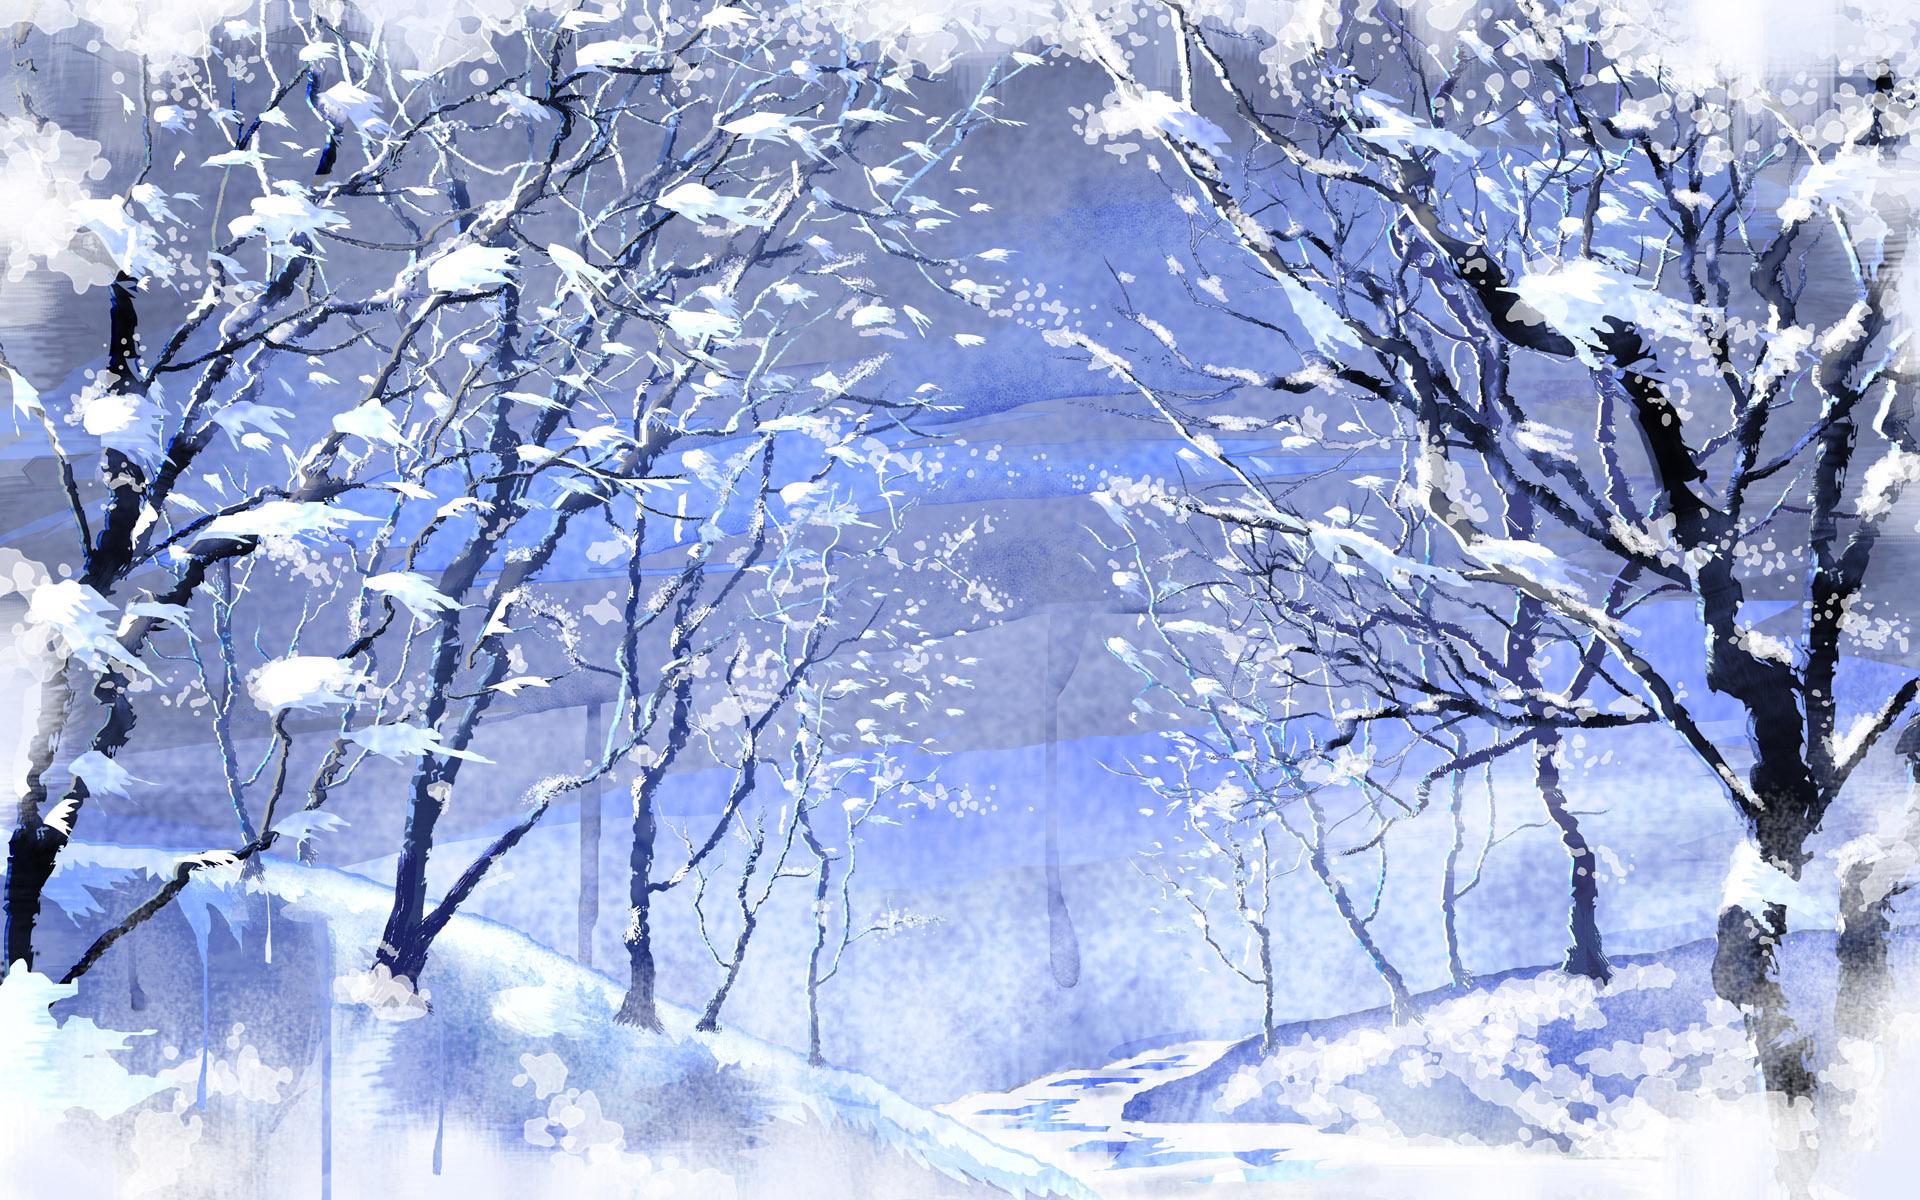 Winter Scene Wallpaper, Winter Scene Computer Wallpaper ...